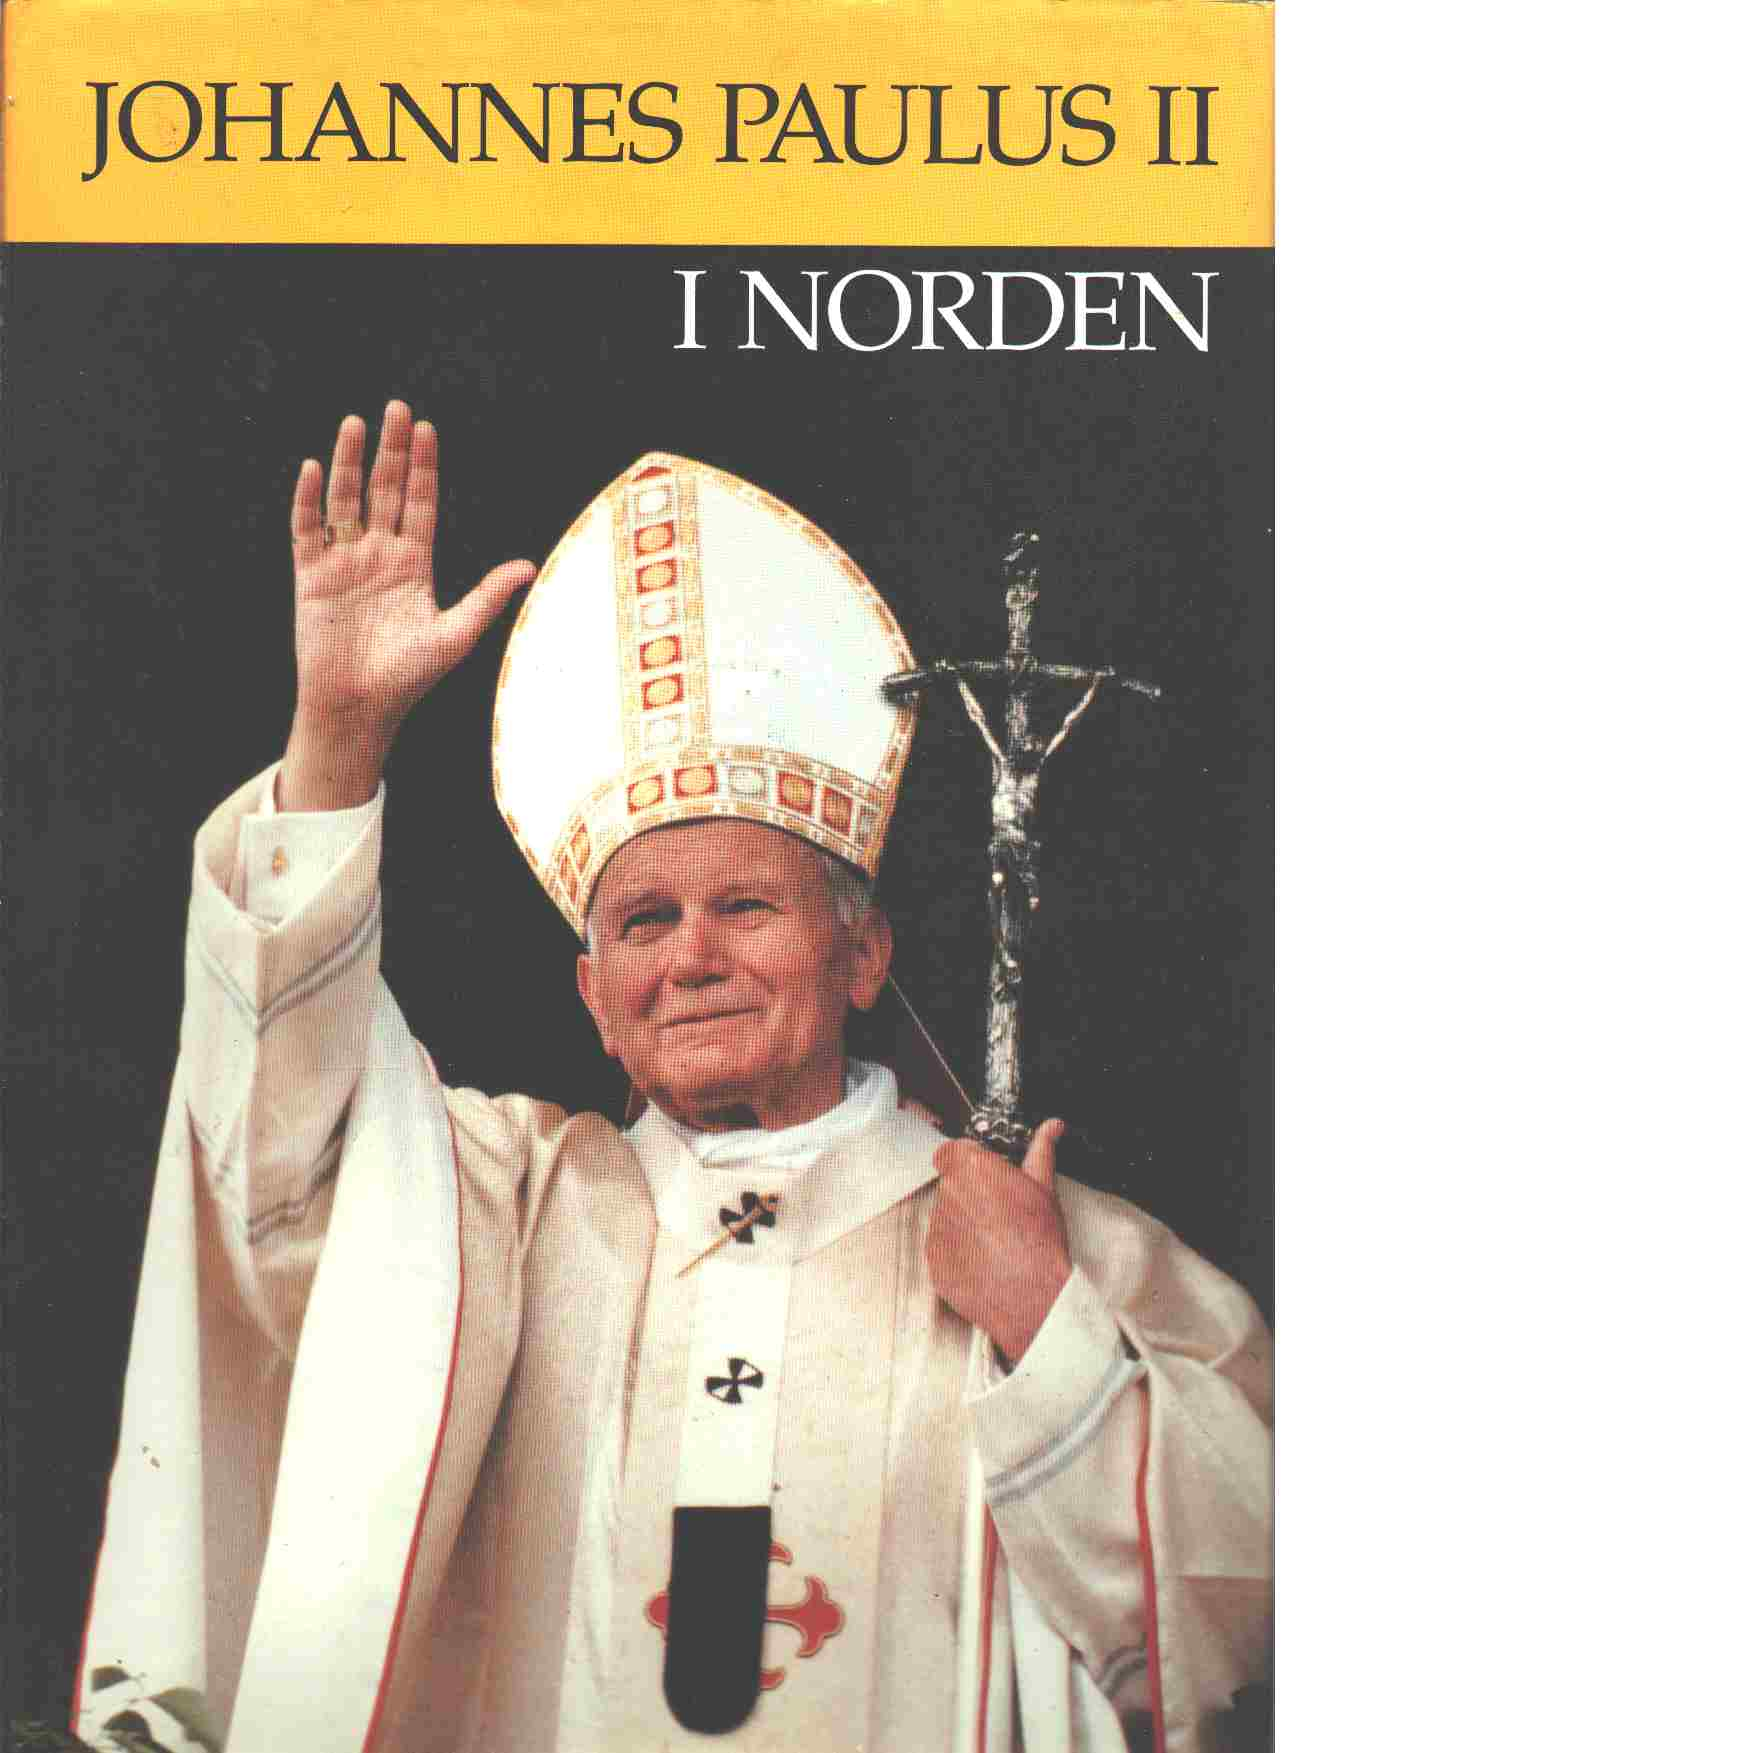 Johannes Paul II i Norden - Red. Joynt, Unni Klepper och Folkegård, Jan